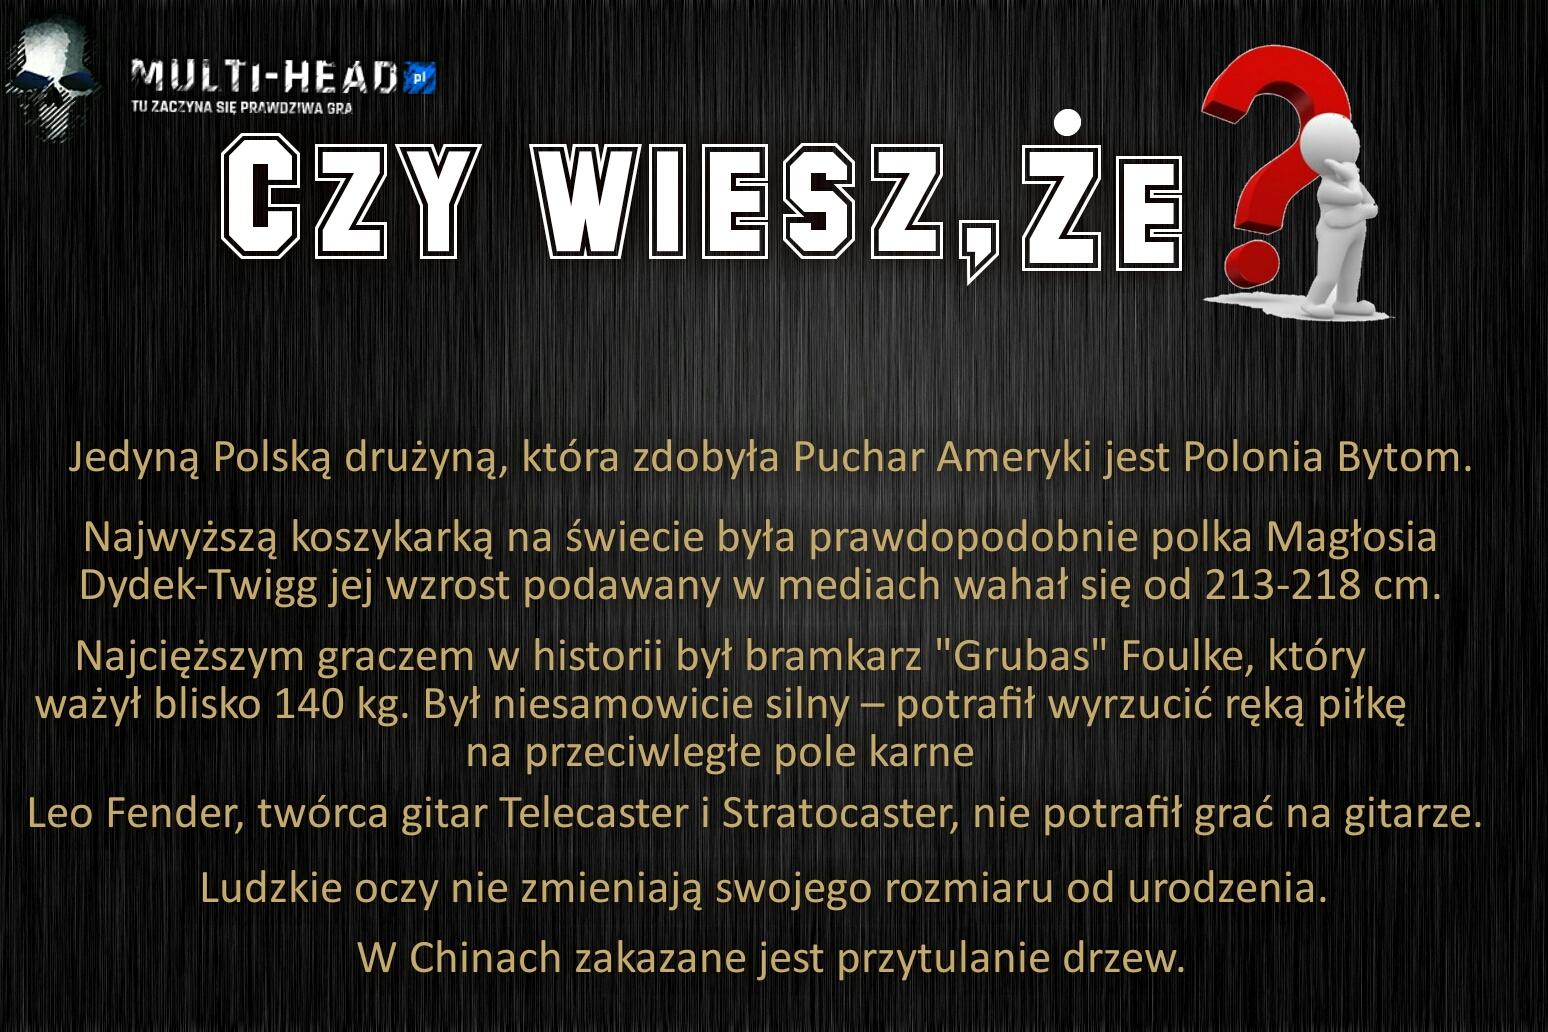 piZap_1511703753934.jpg